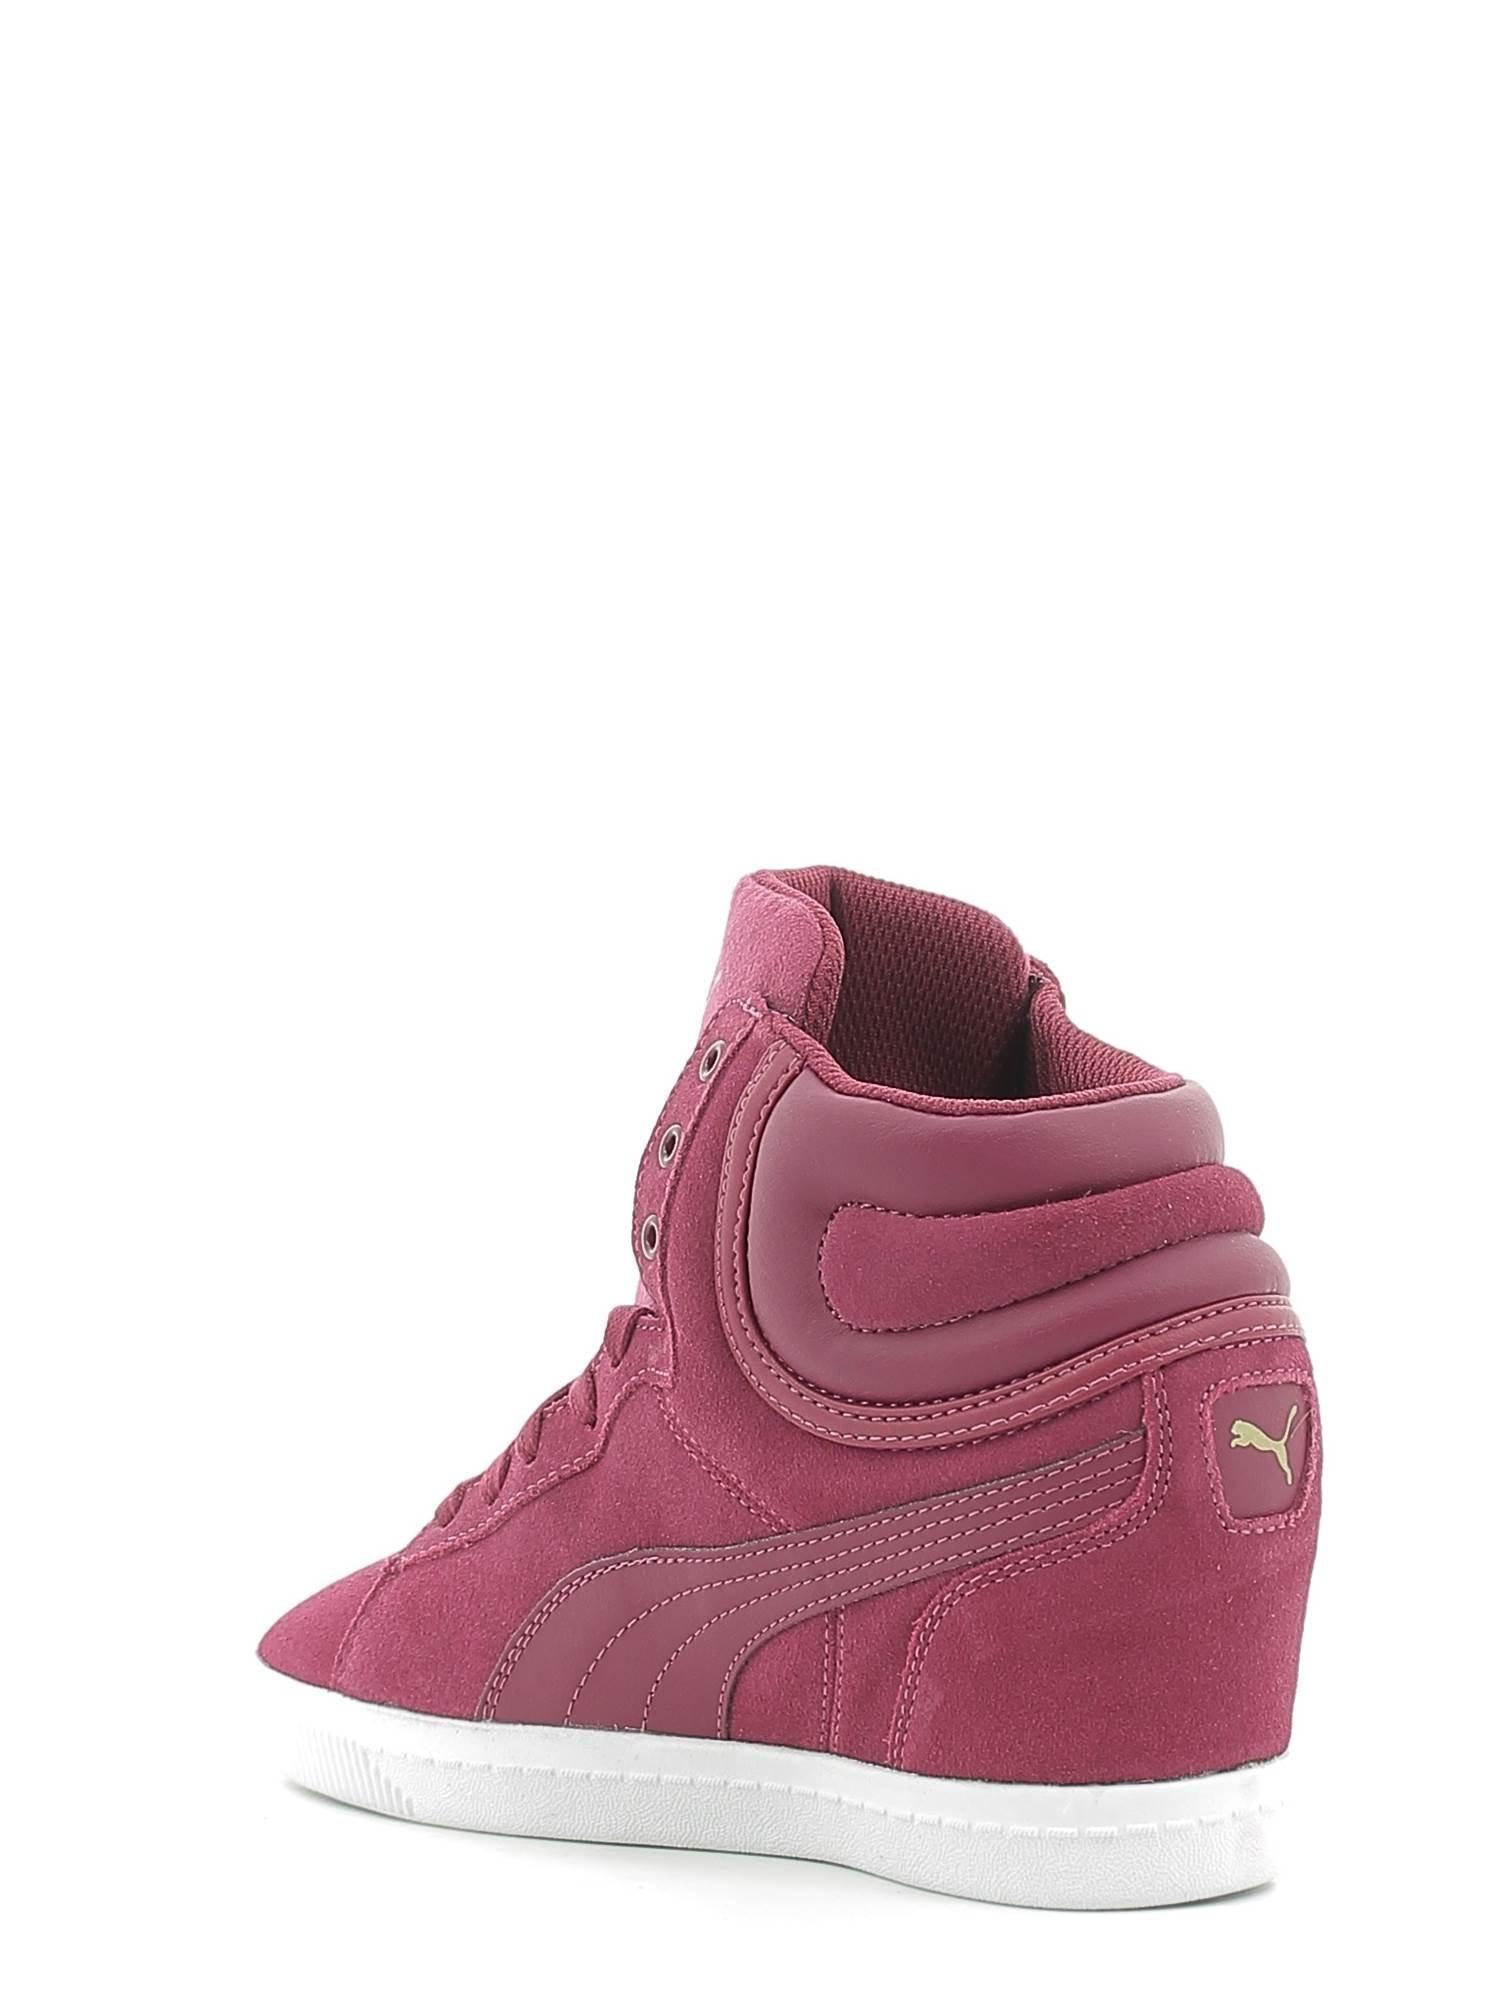 Puma - Vikky Wedge - 35724609 - Colore: Bordeaux - Taglia: 38.5